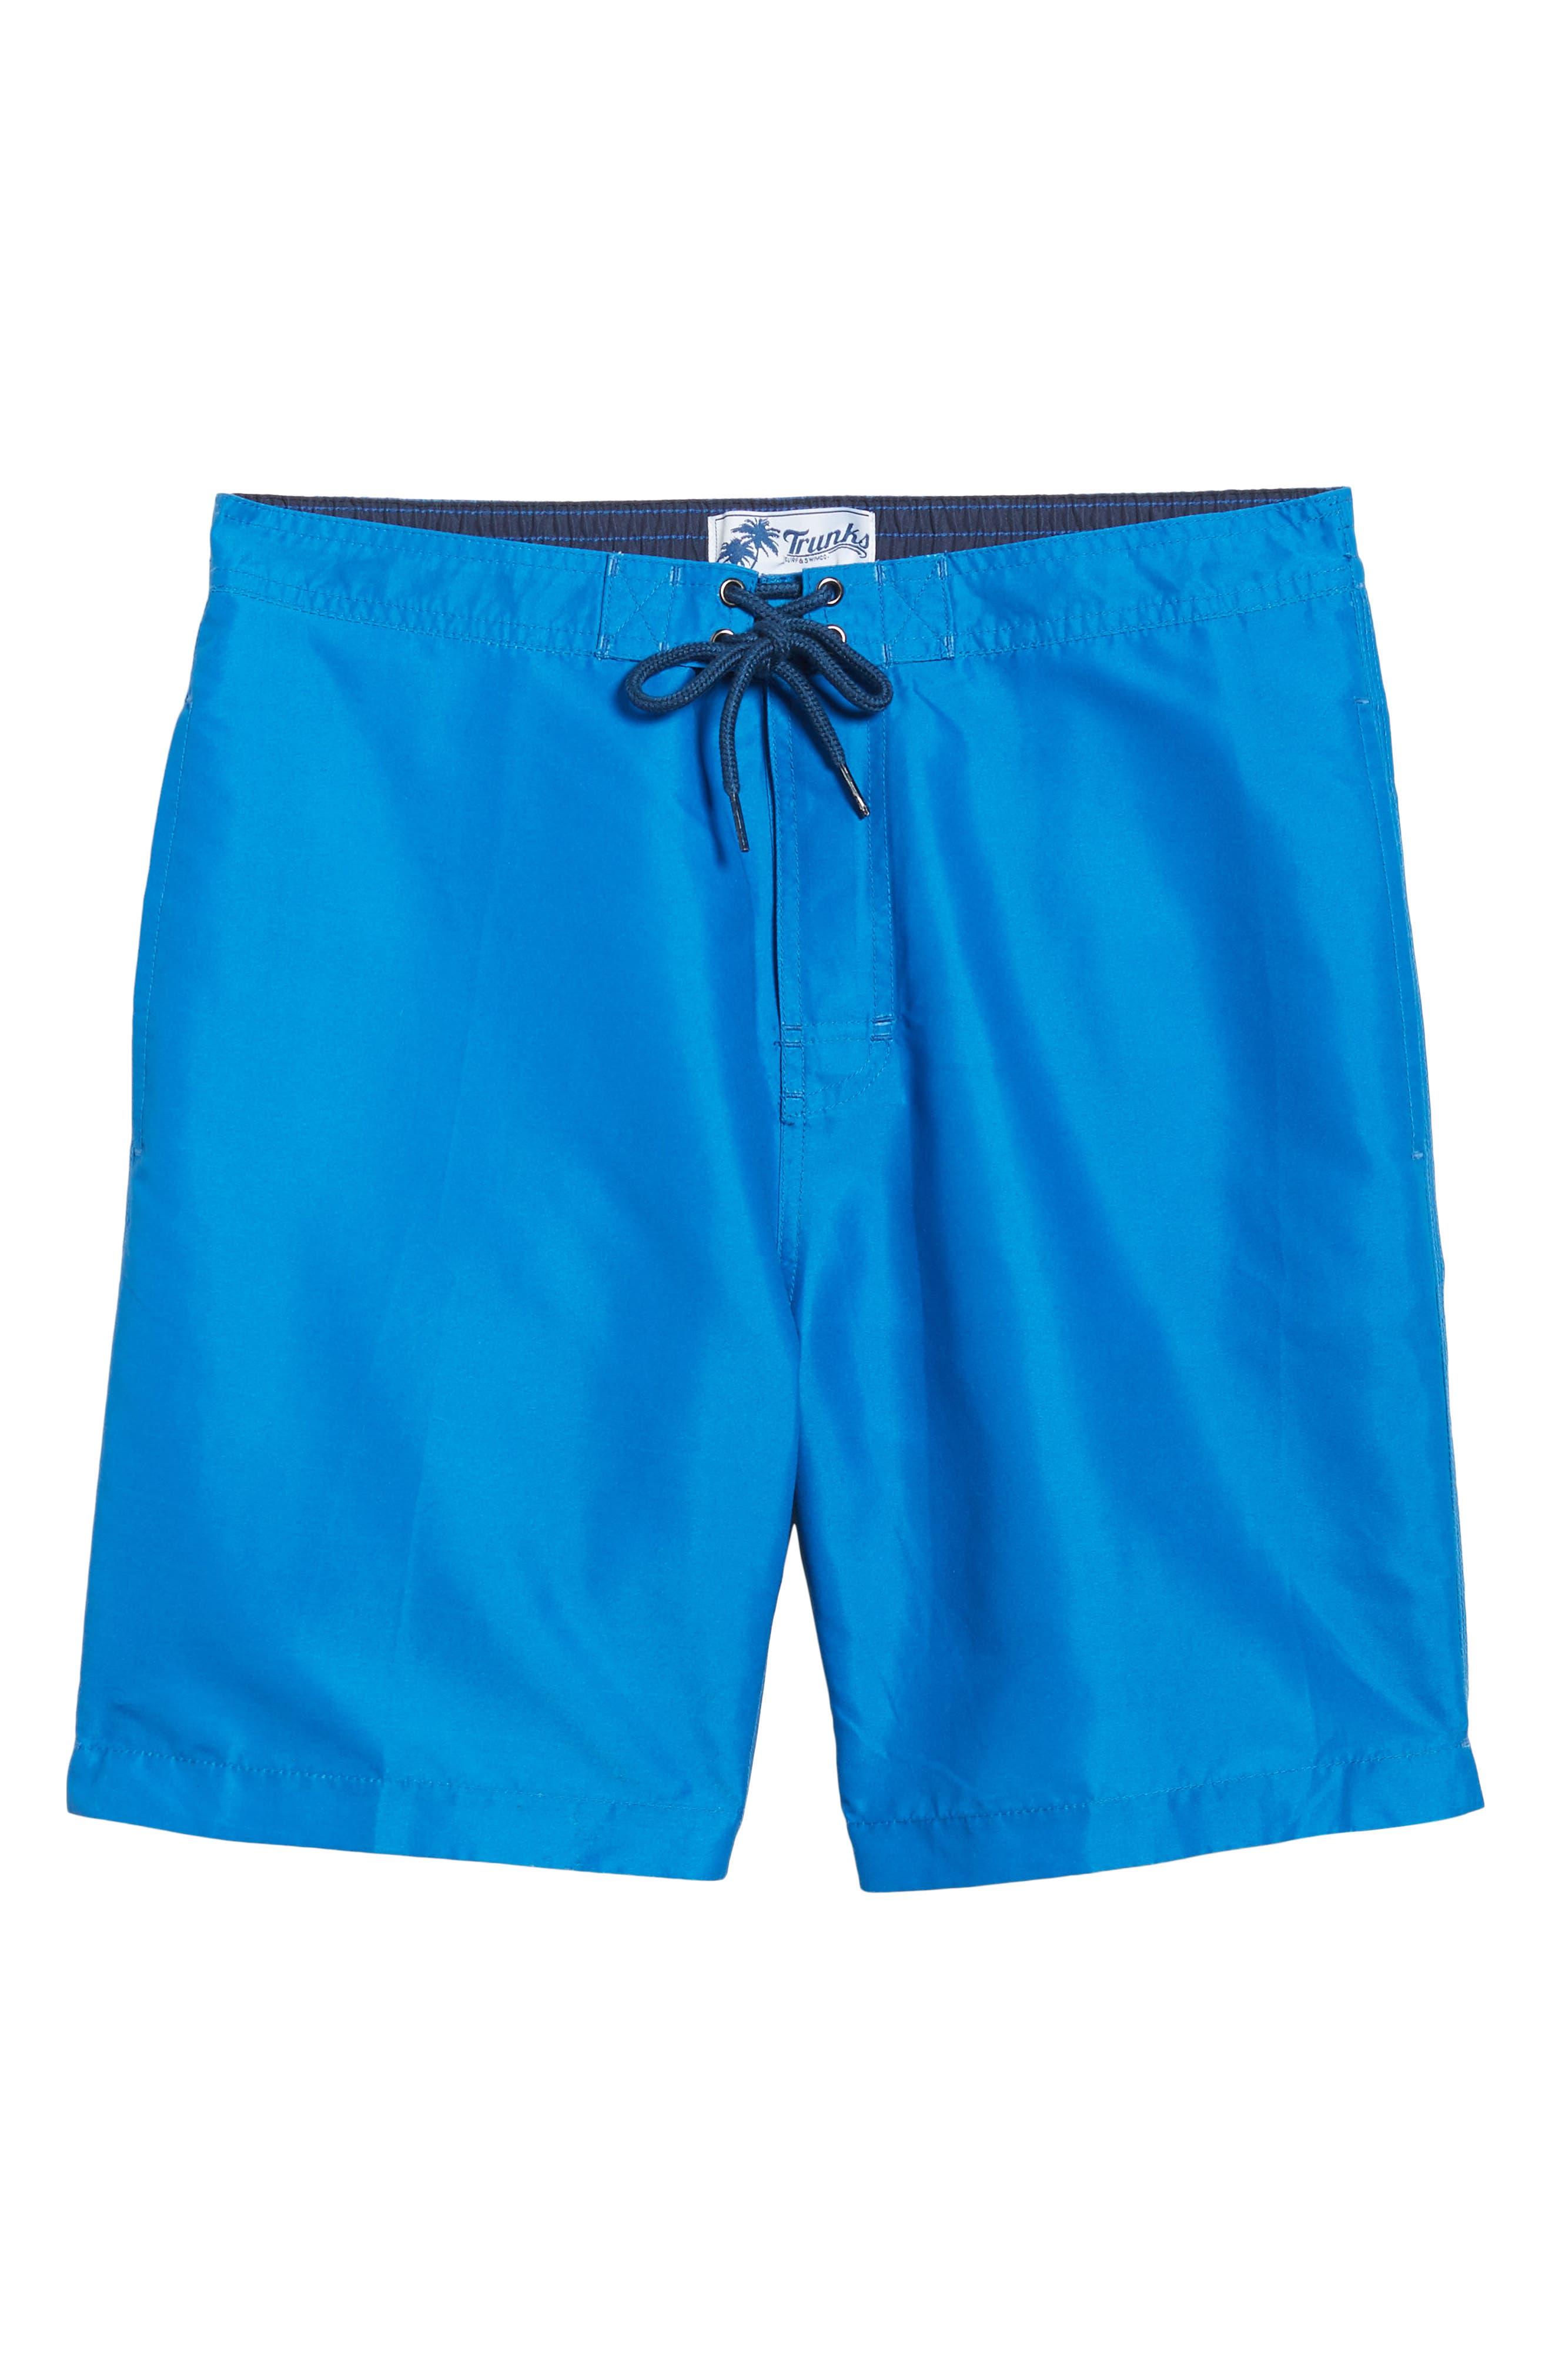 Swami Solid Board Shorts,                             Alternate thumbnail 6, color,                             Nautical Blue/ Marine